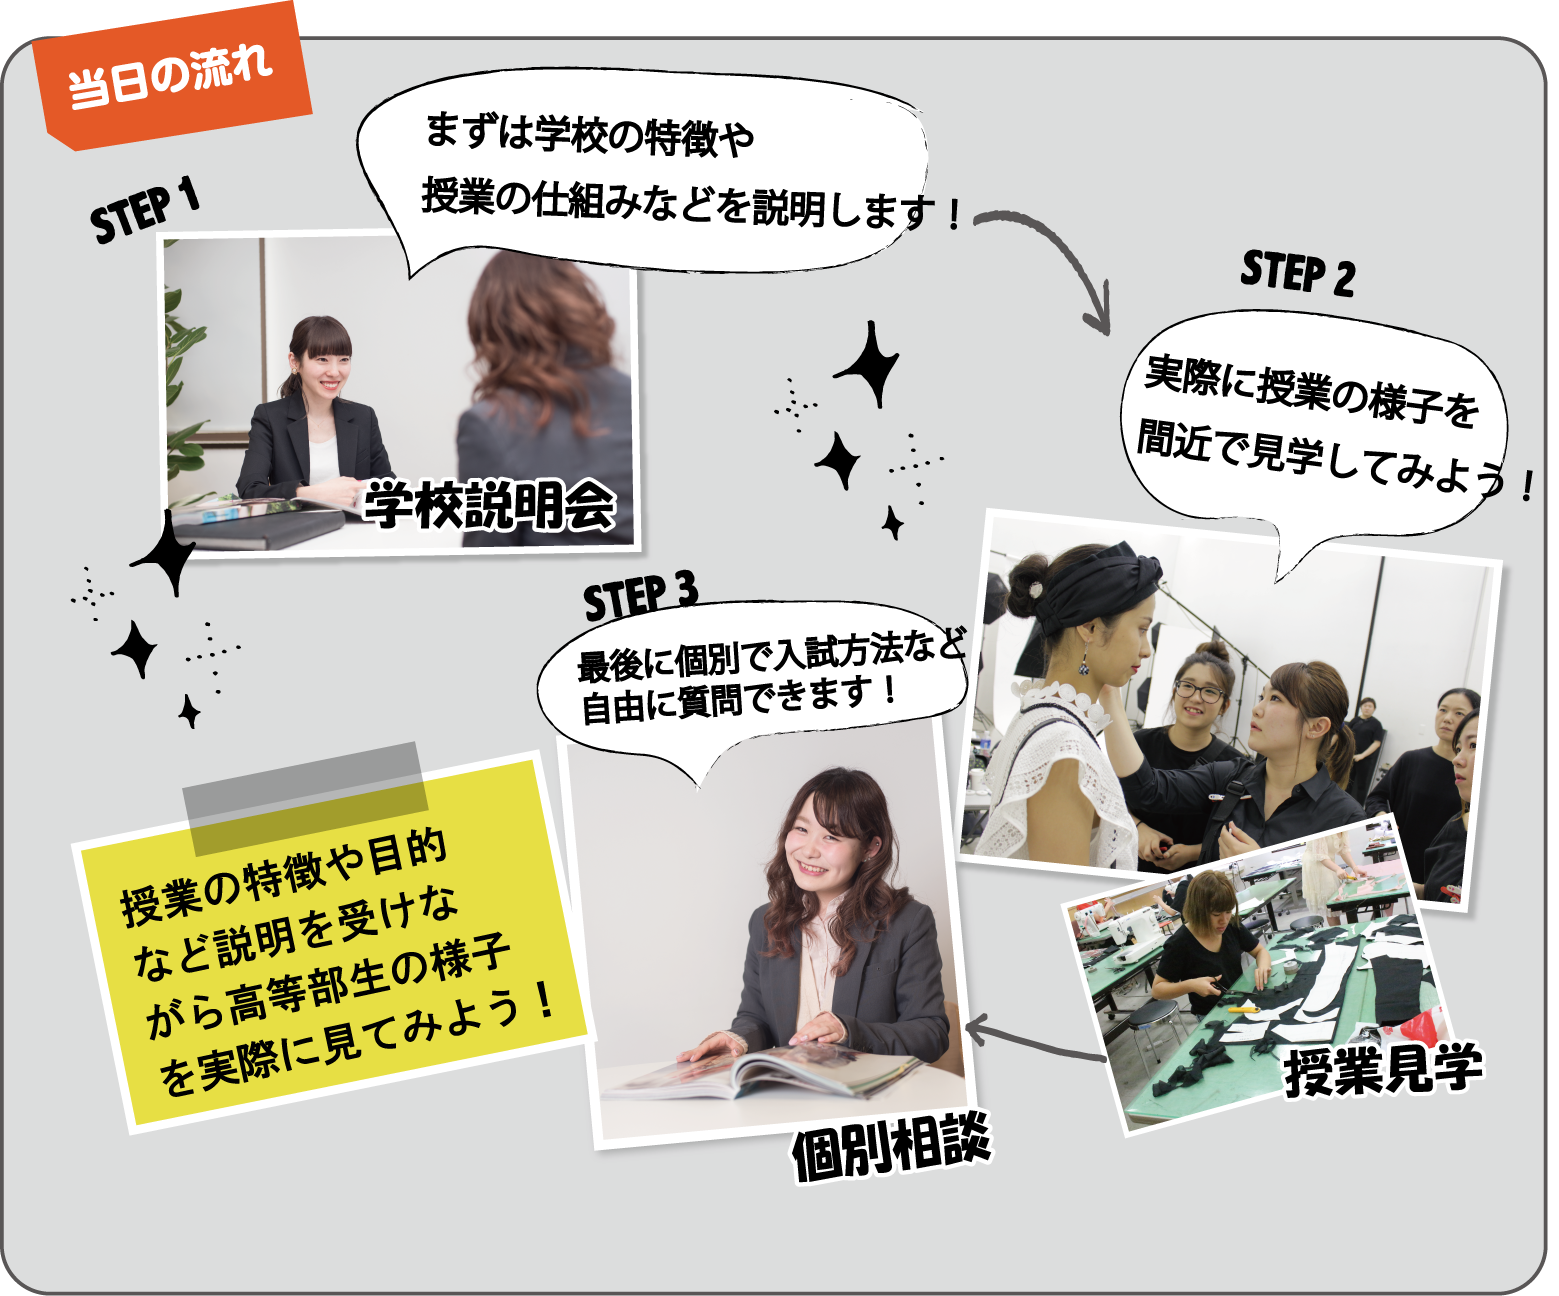 19VDH授業見学_当日の流れ.png